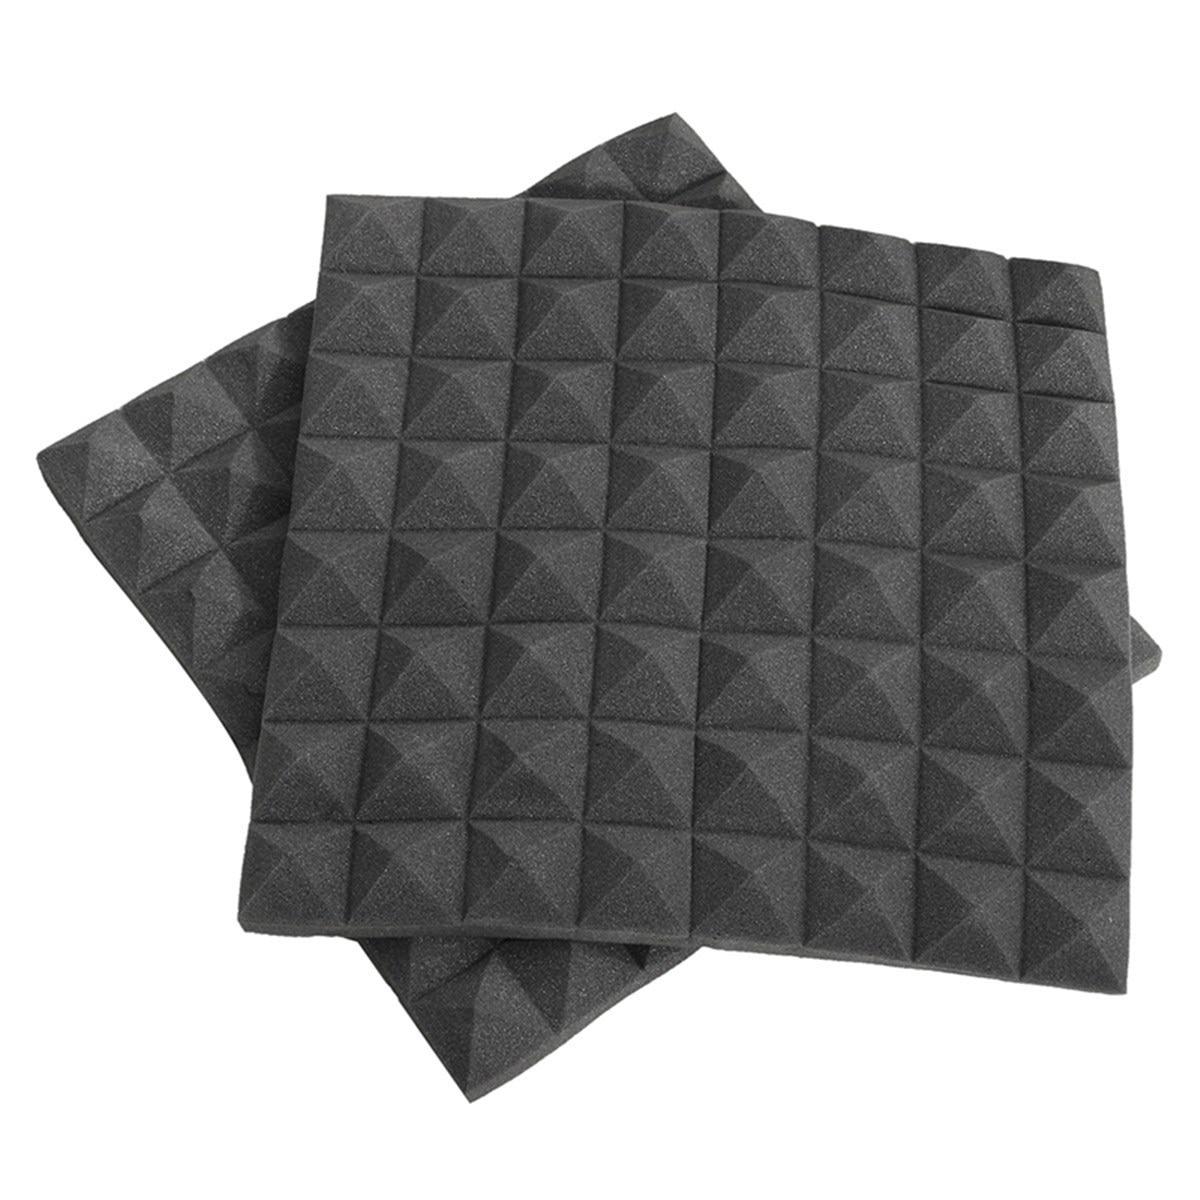 Sound Foam Panels For Walls : Hot sale pcs soundproofing foams acoustic wedge studio